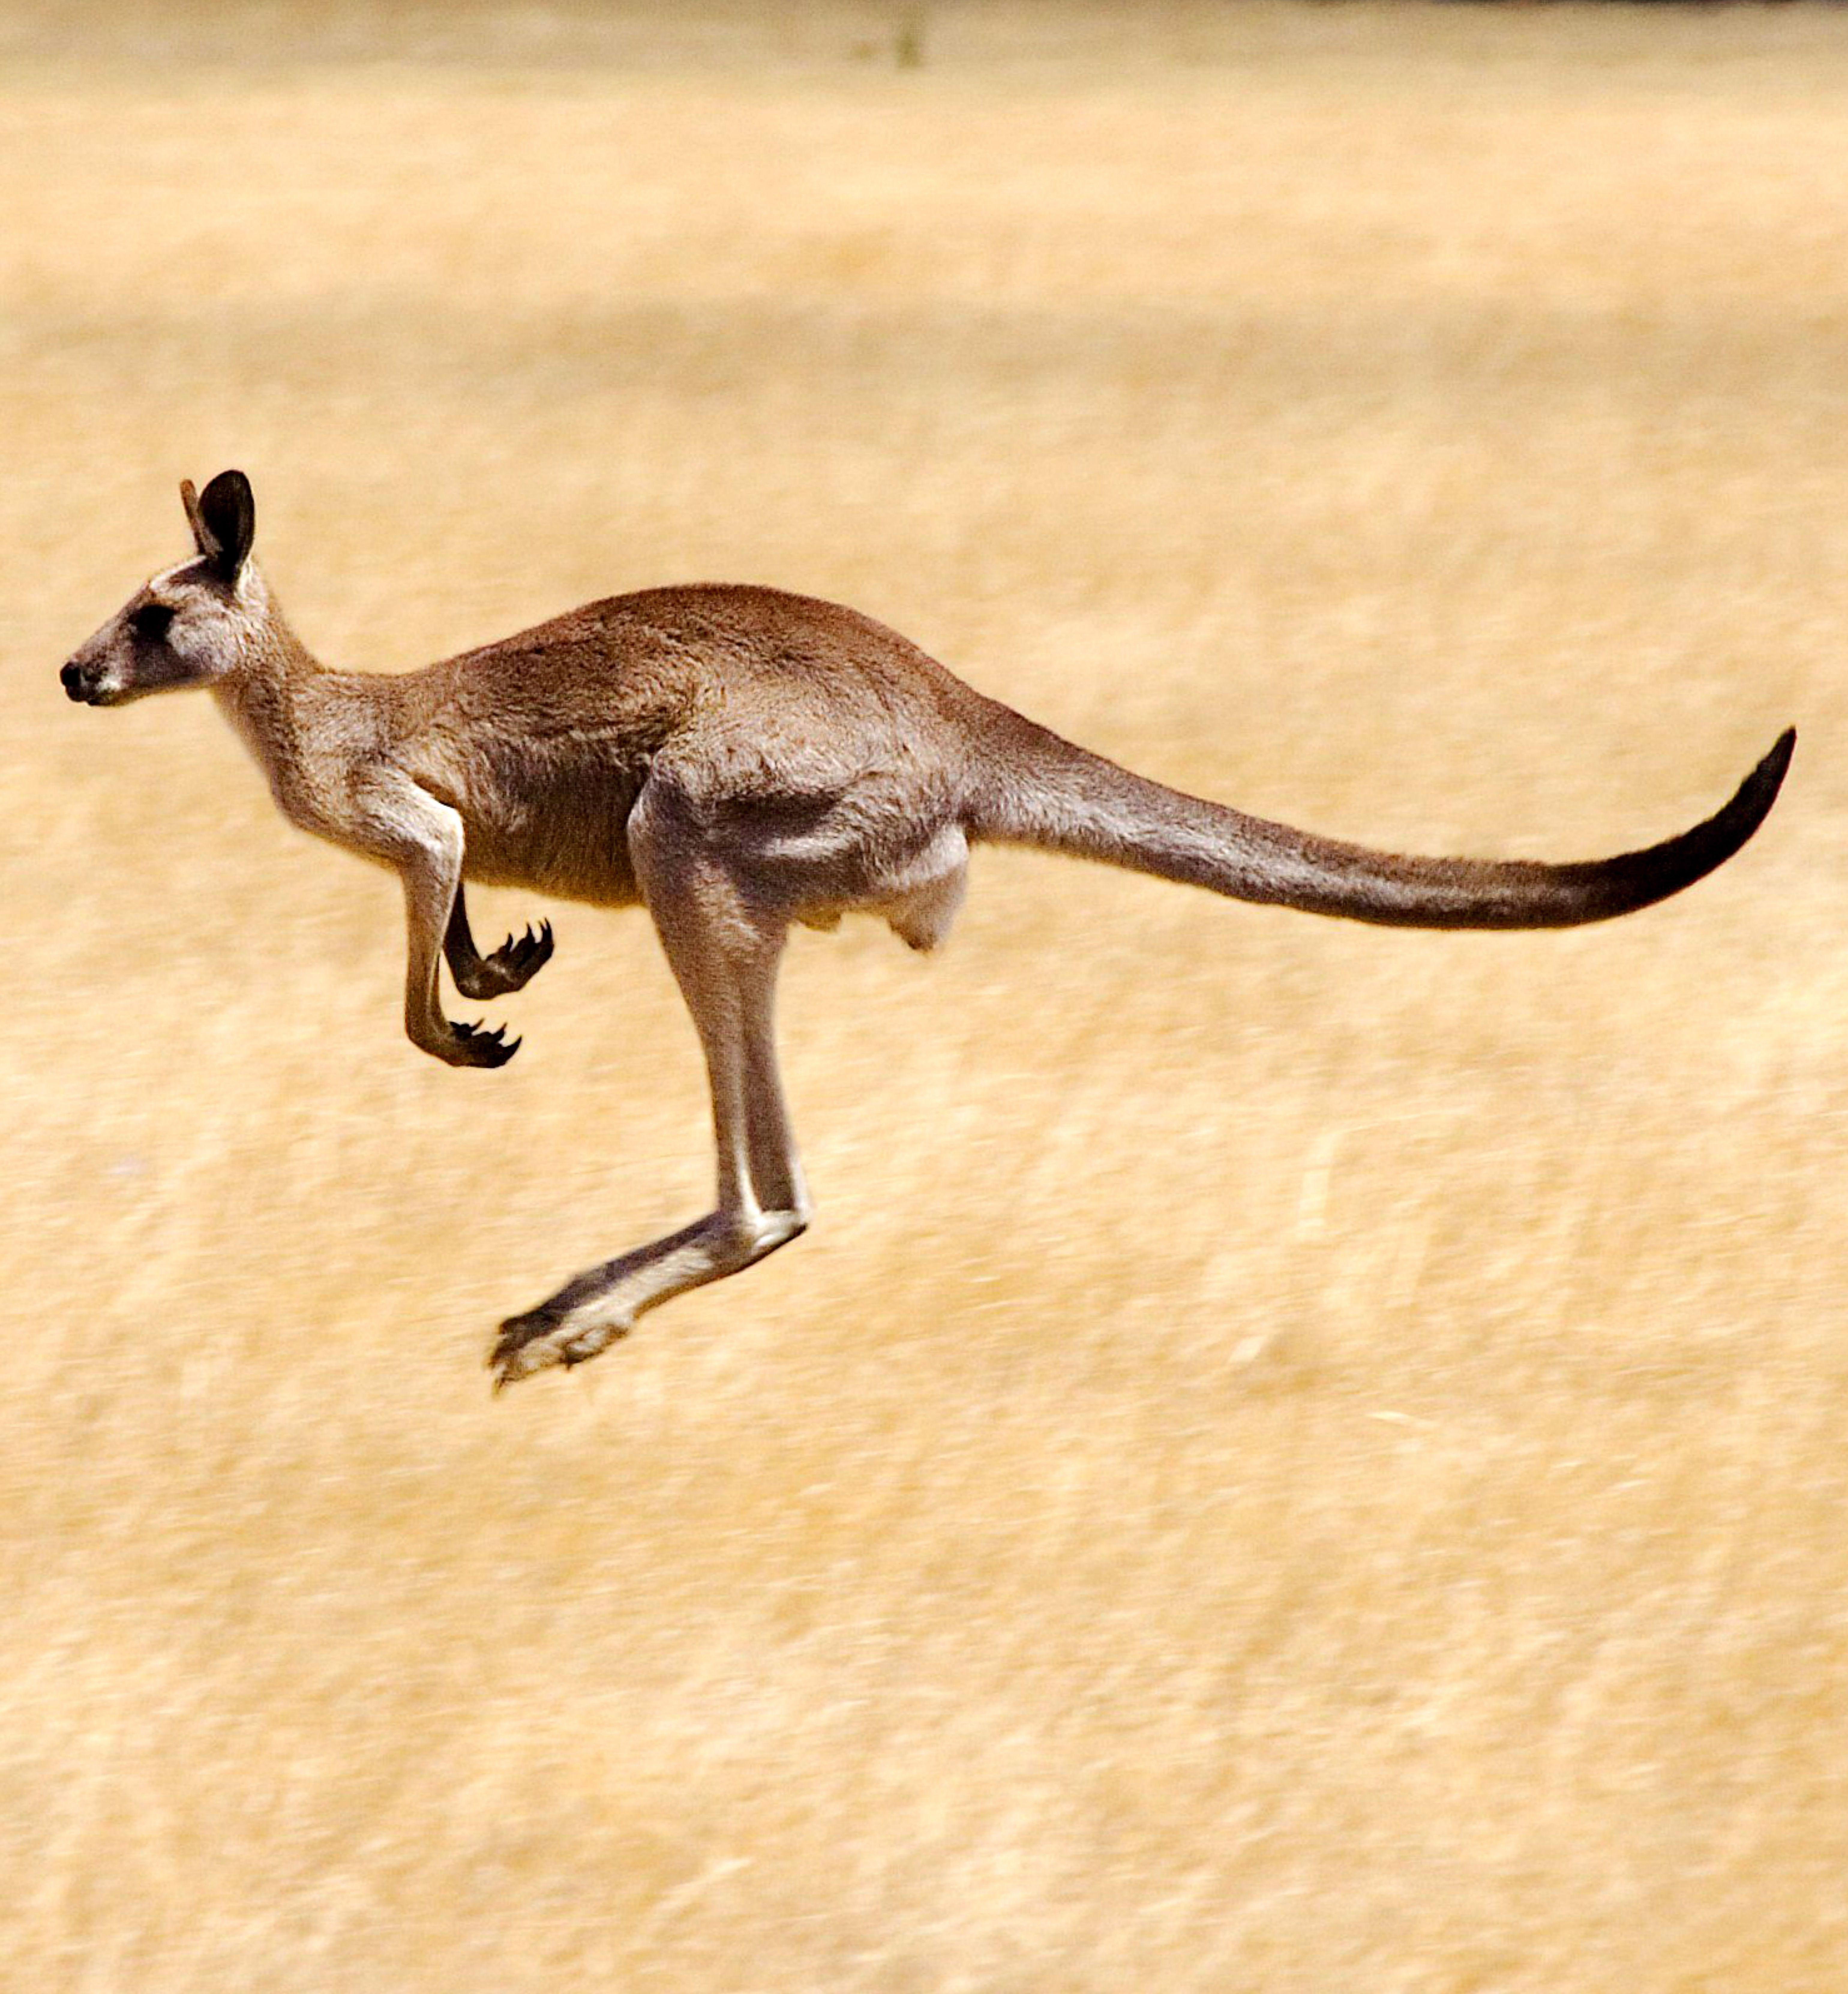 Kangaroos One Of Australia S Most Iconic Animals Australia Animals Australian Animals Kangaroo